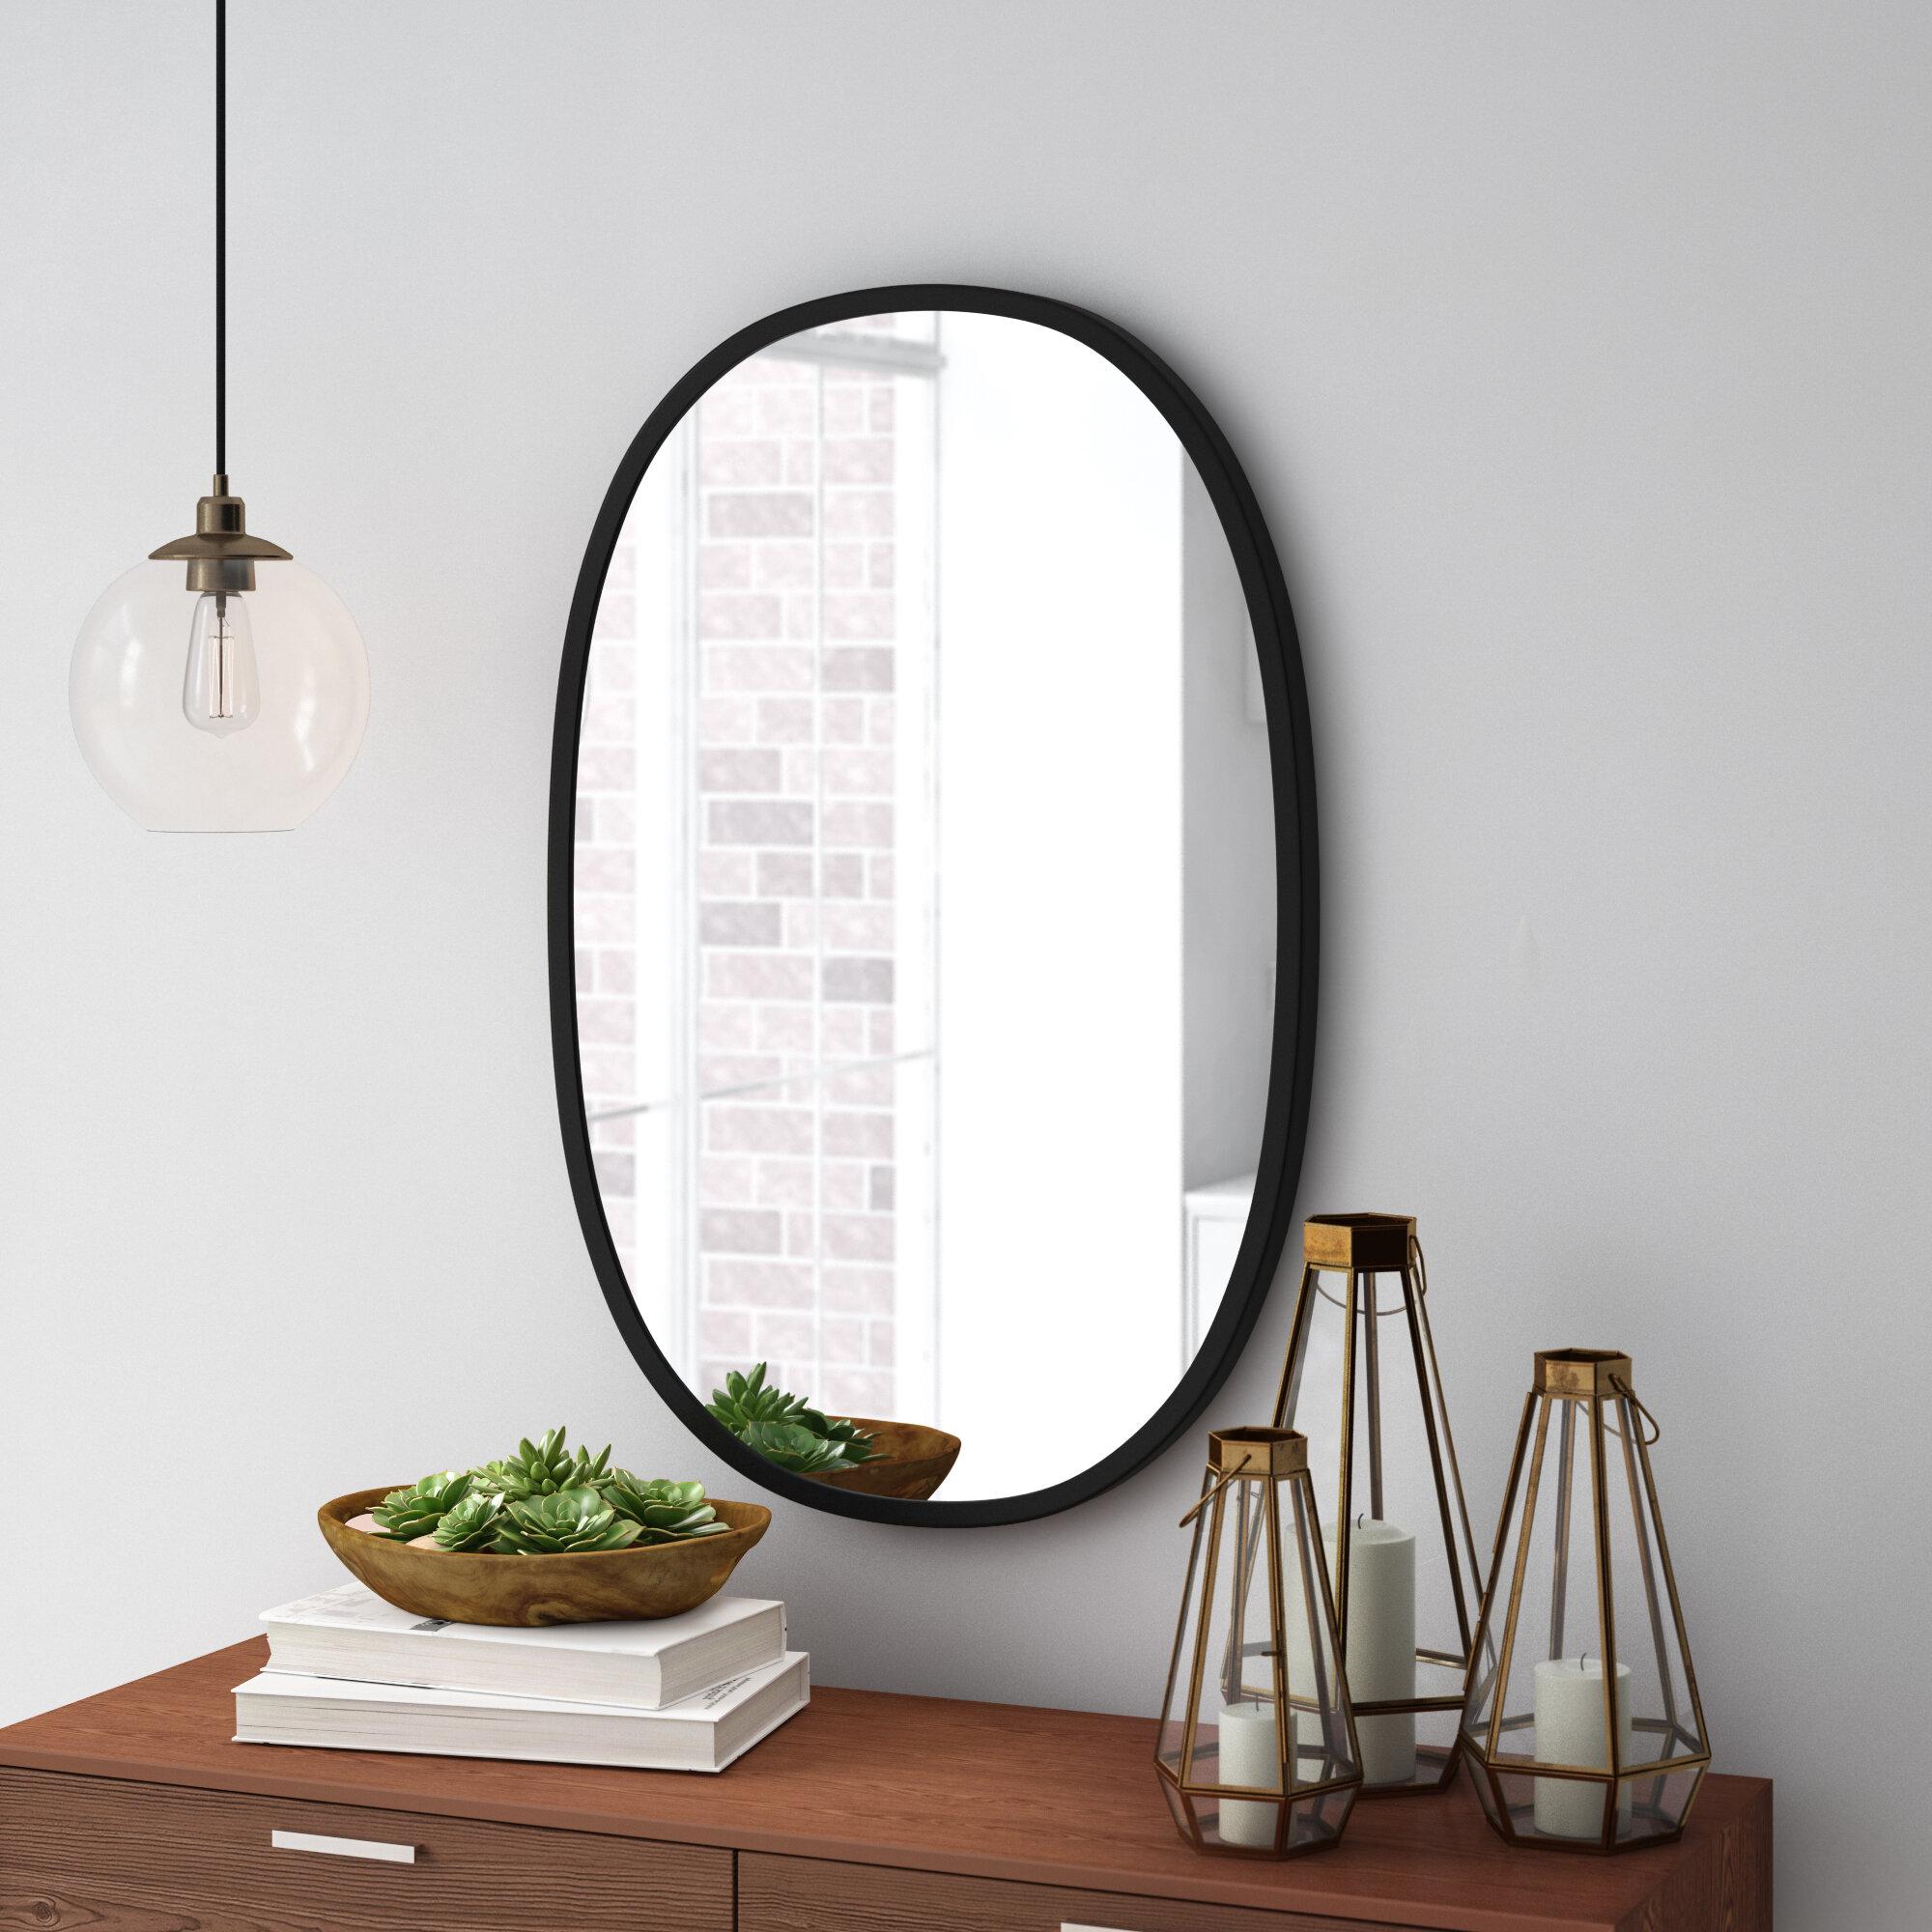 Umbra Hub Oval Modern Contemporary Accent Mirror Reviews Wayfair Ca